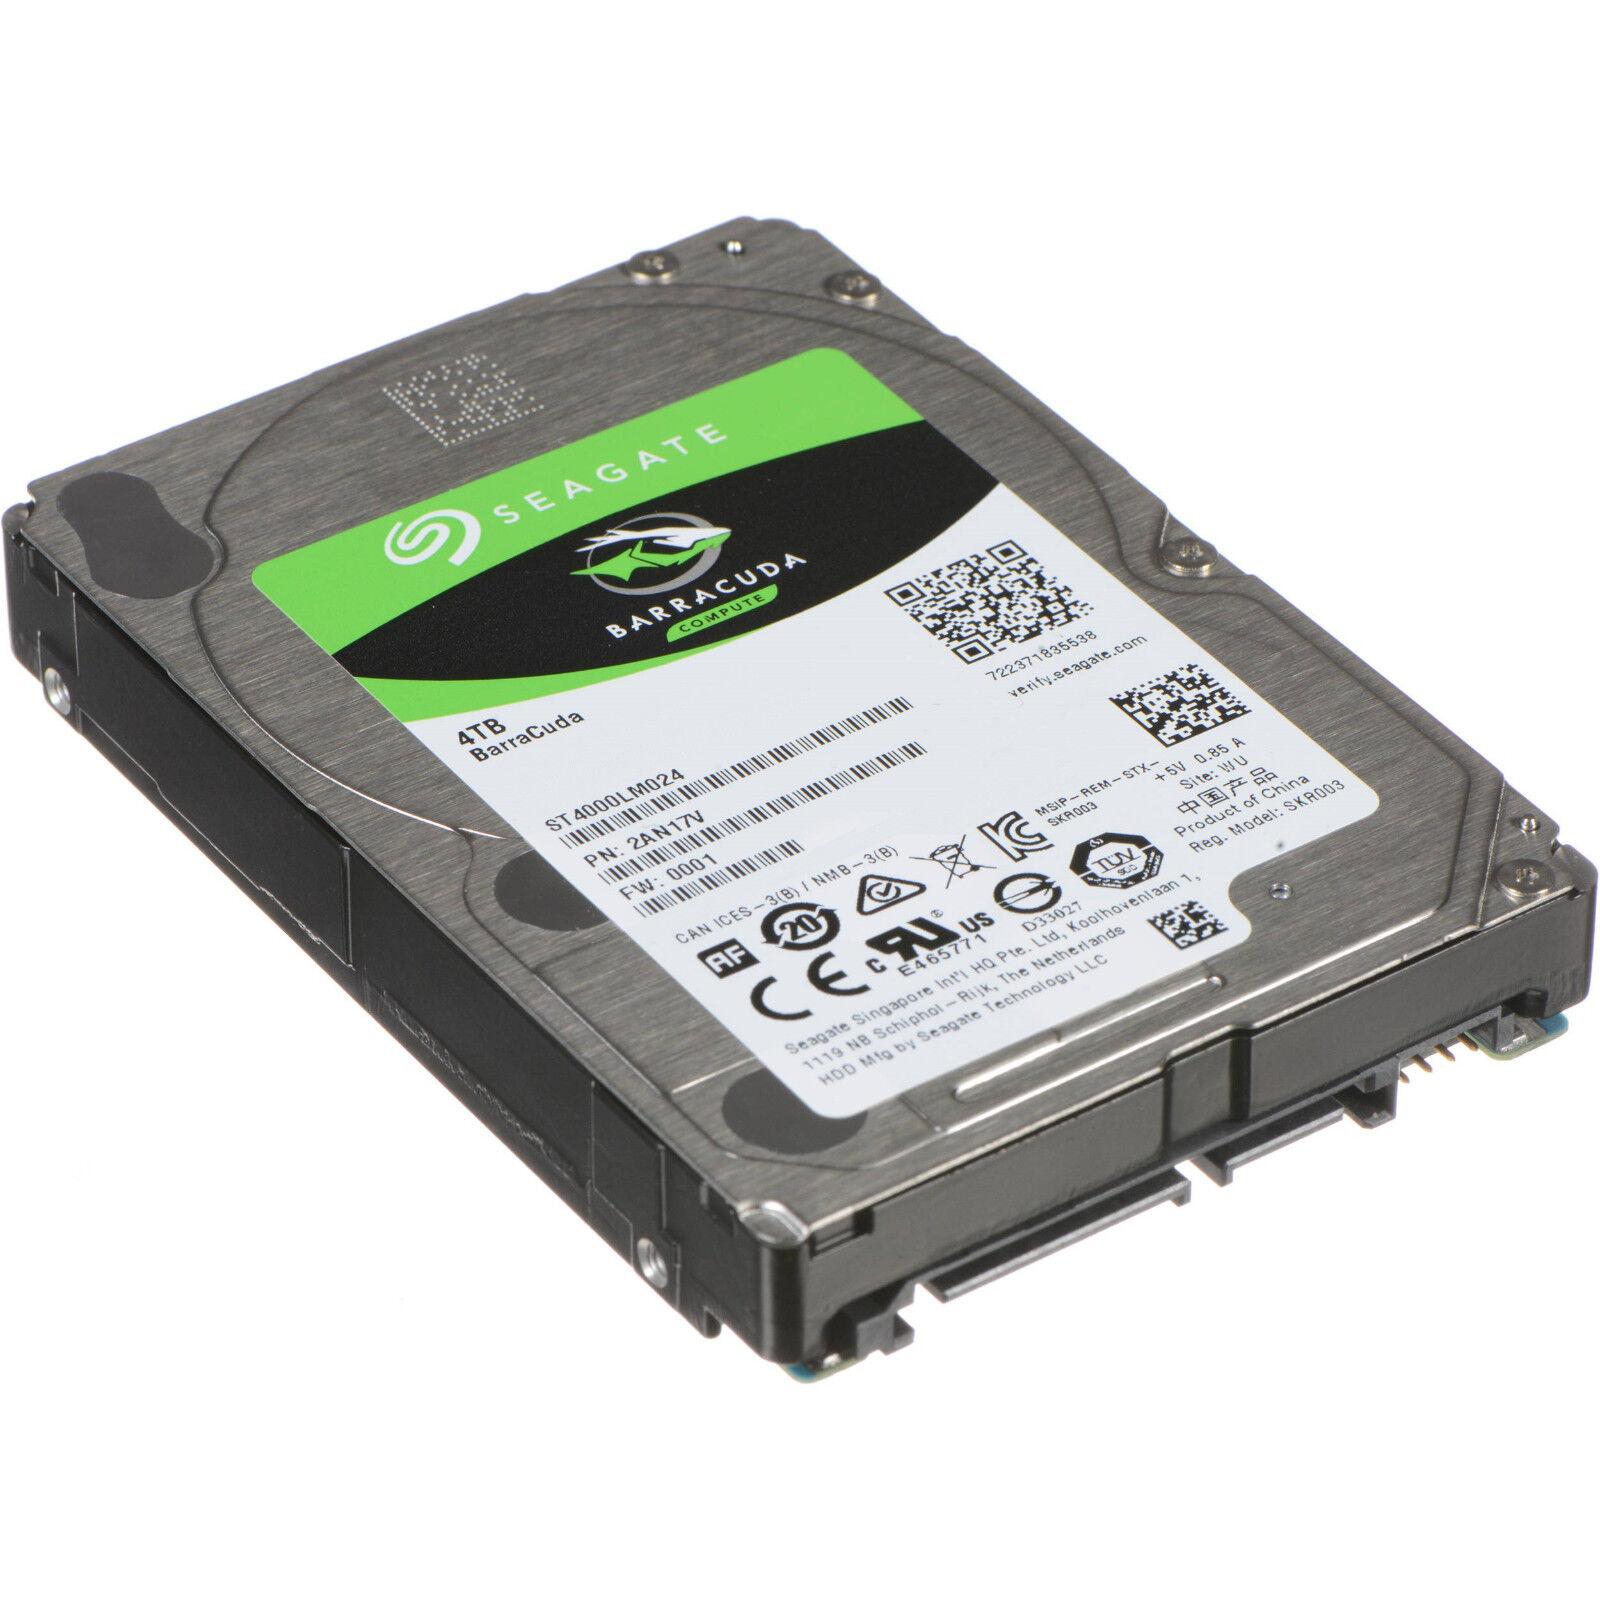 Seagate BarraCuda | 4TB Festplatte | ST4000LM024 | SATA 6Gb/s | 2,5